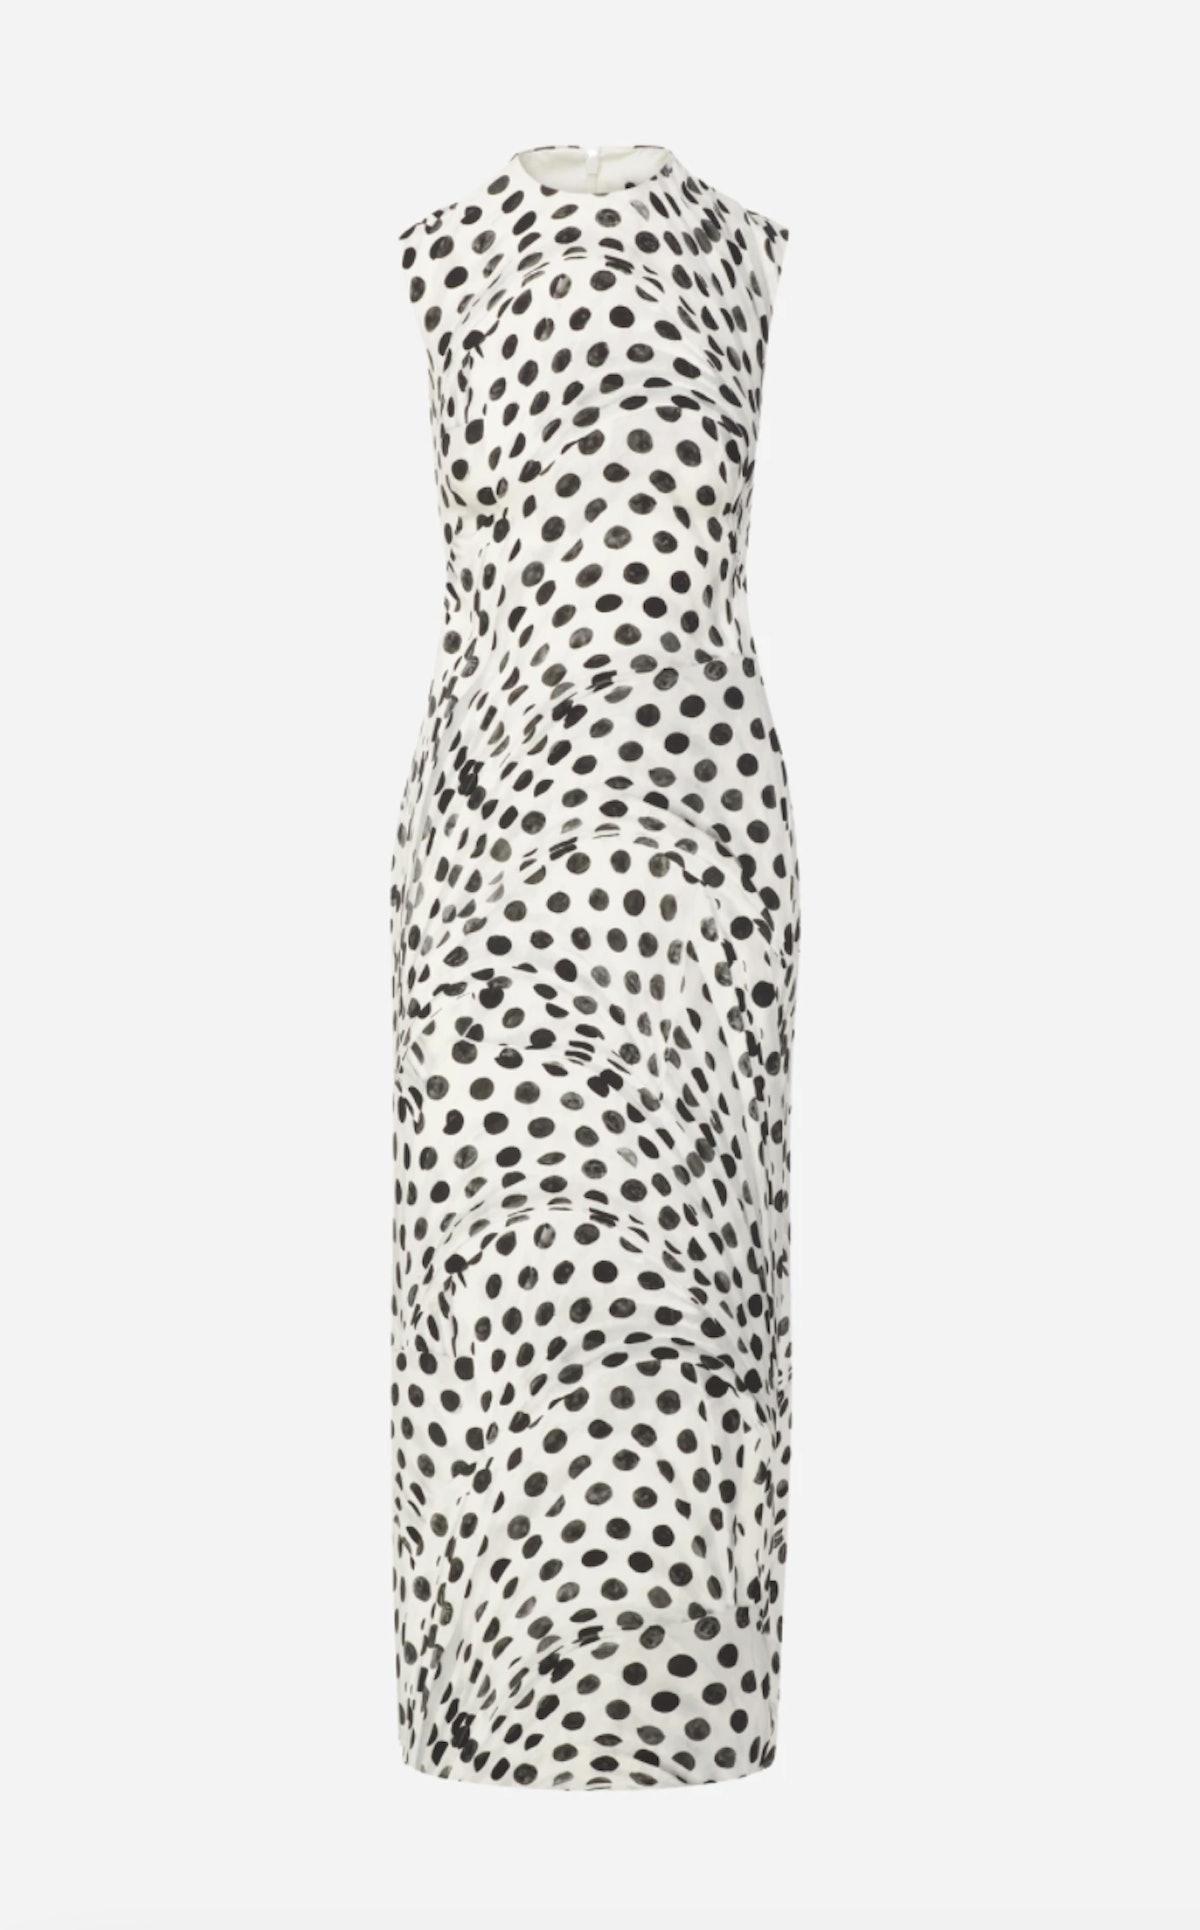 Brandon Maxwell's sleeveless polka dot Audrey Sheath dress.